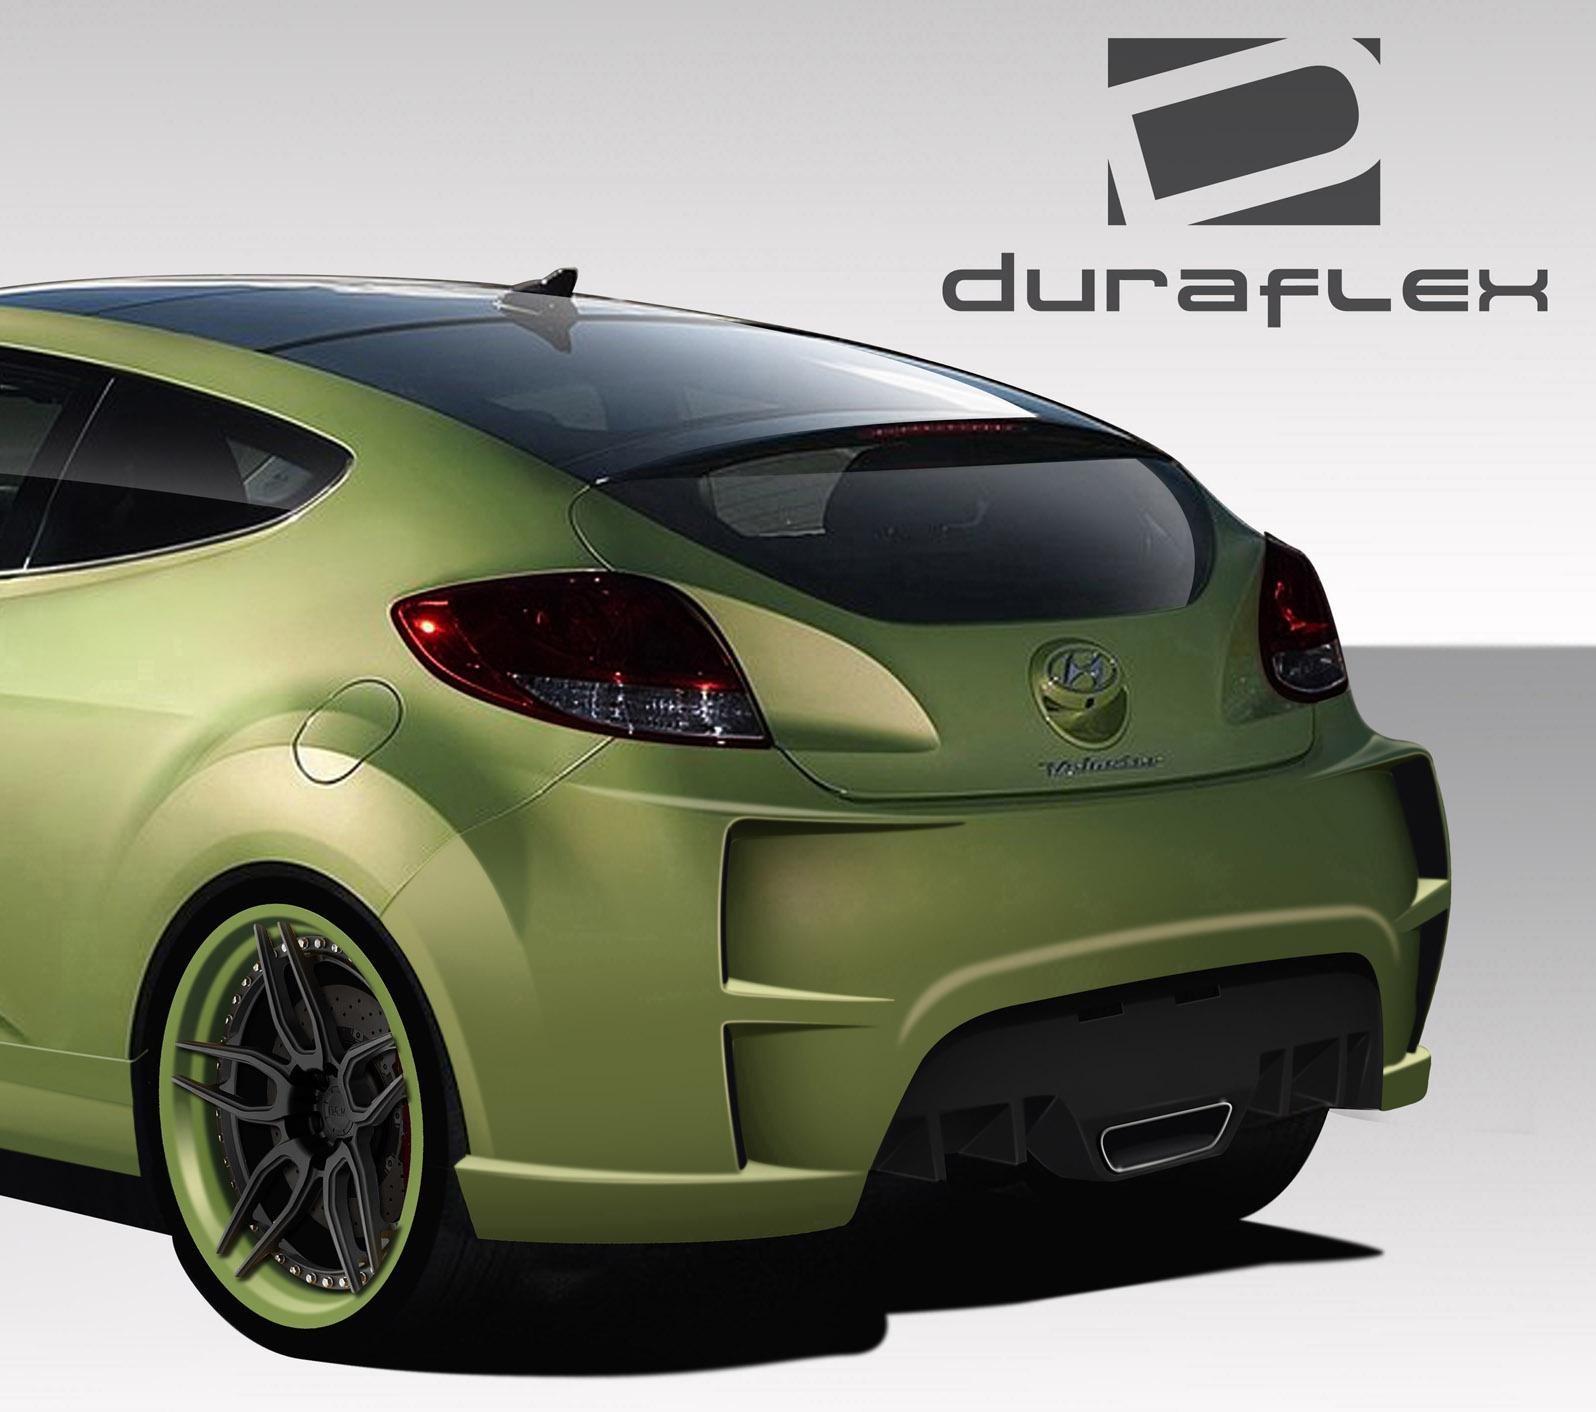 2012-2016 Hyundai Veloster Duraflex VG-R Side Skirts Rocker Panels - 2 Piece